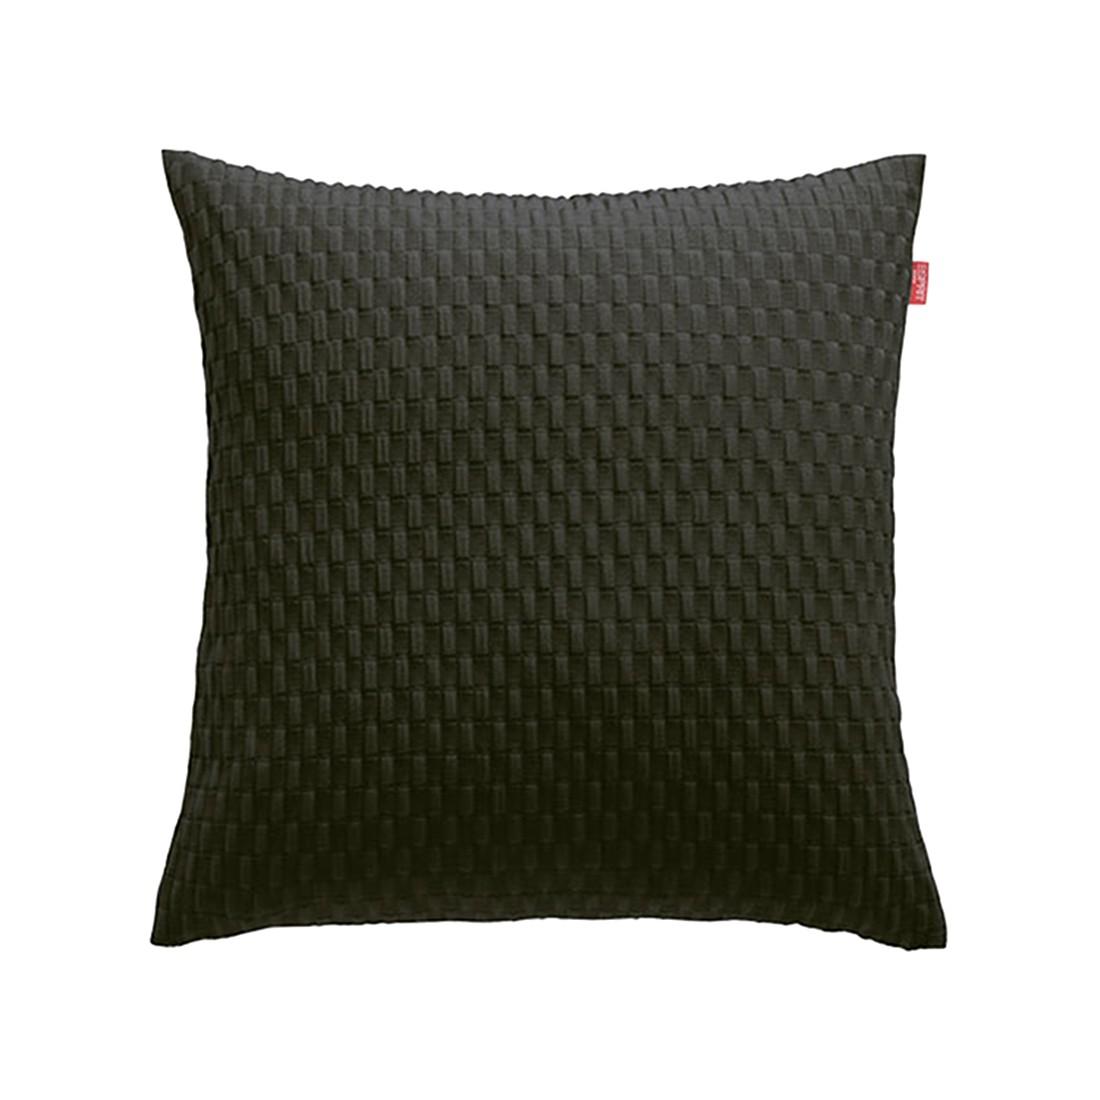 kissen online kaufen. Black Bedroom Furniture Sets. Home Design Ideas